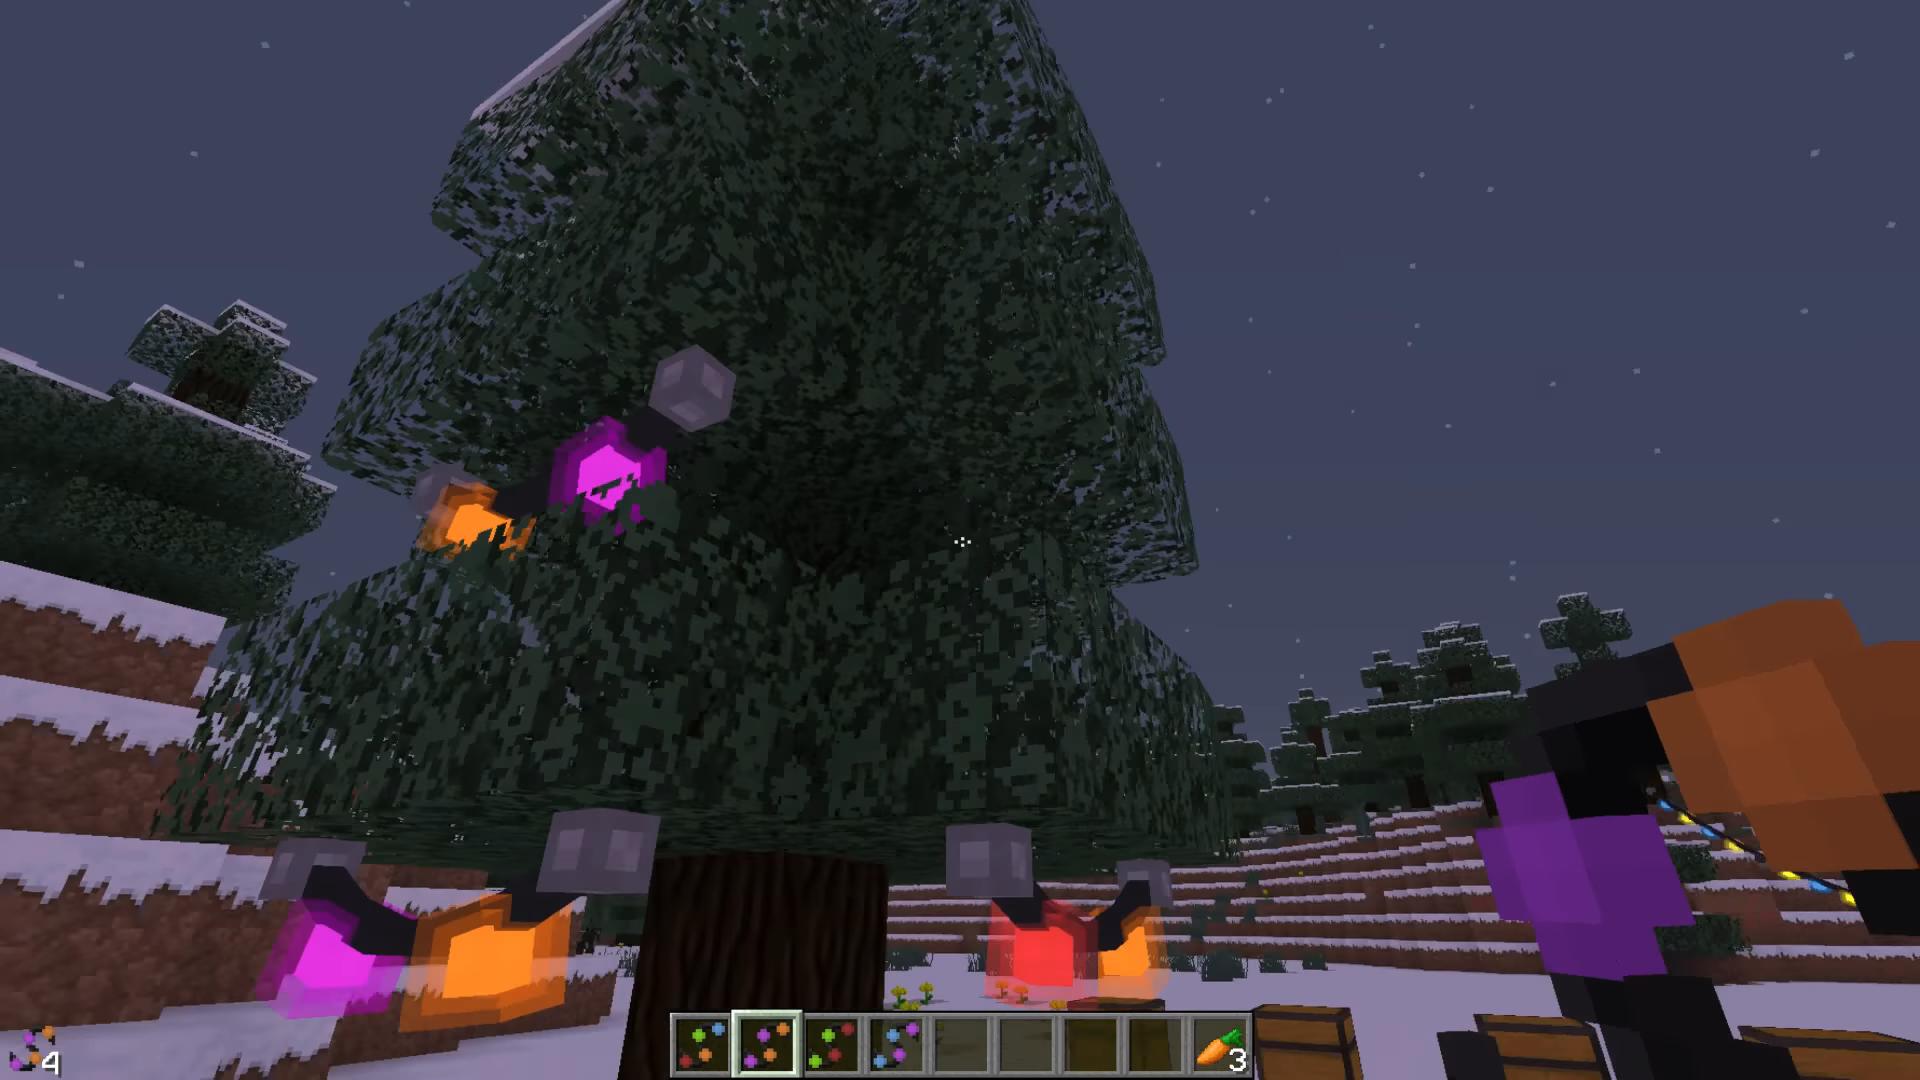 Мод «Fairy Lights» (Новогодние гирлянды) - скриншот 1